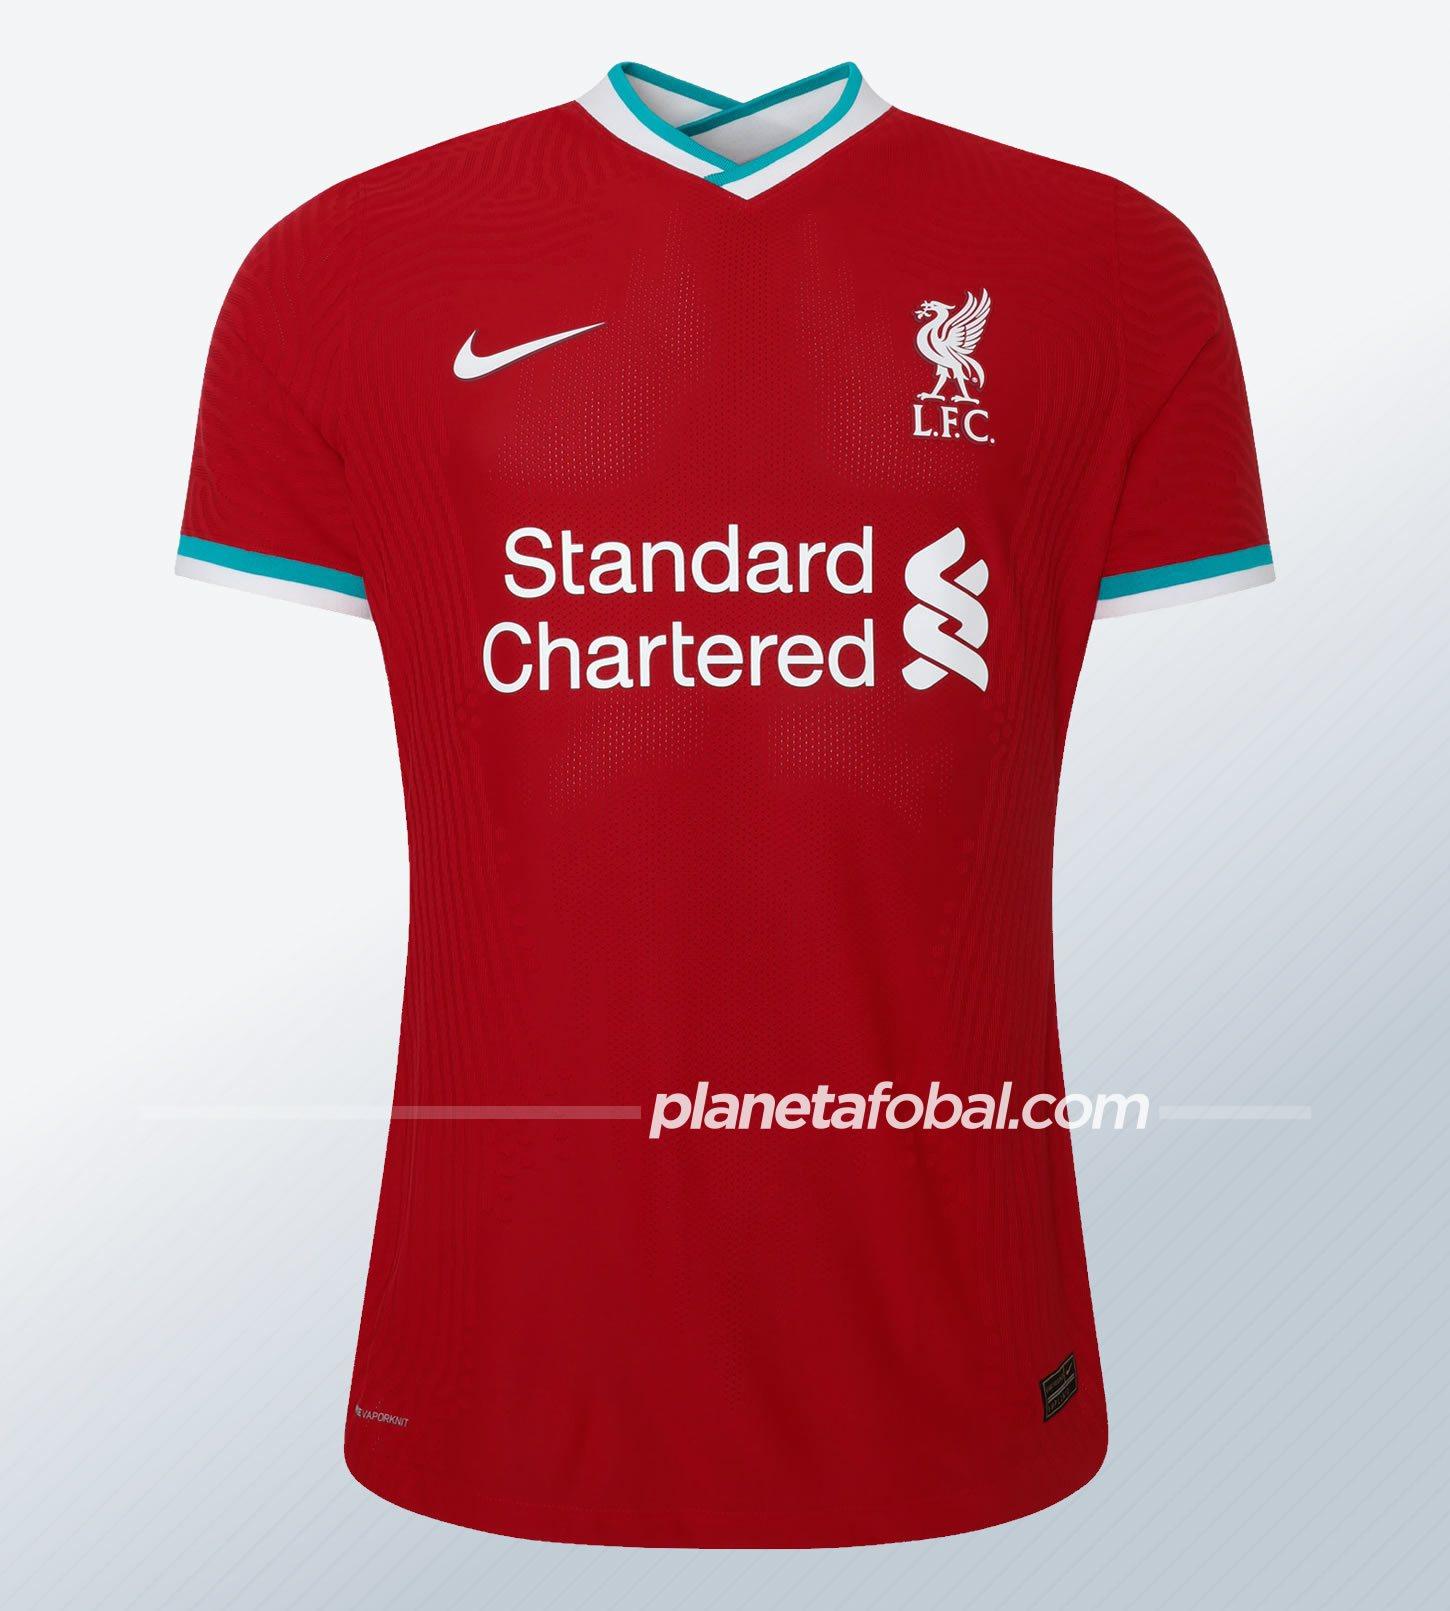 Camiseta Nike del Liverpool 2020/2021